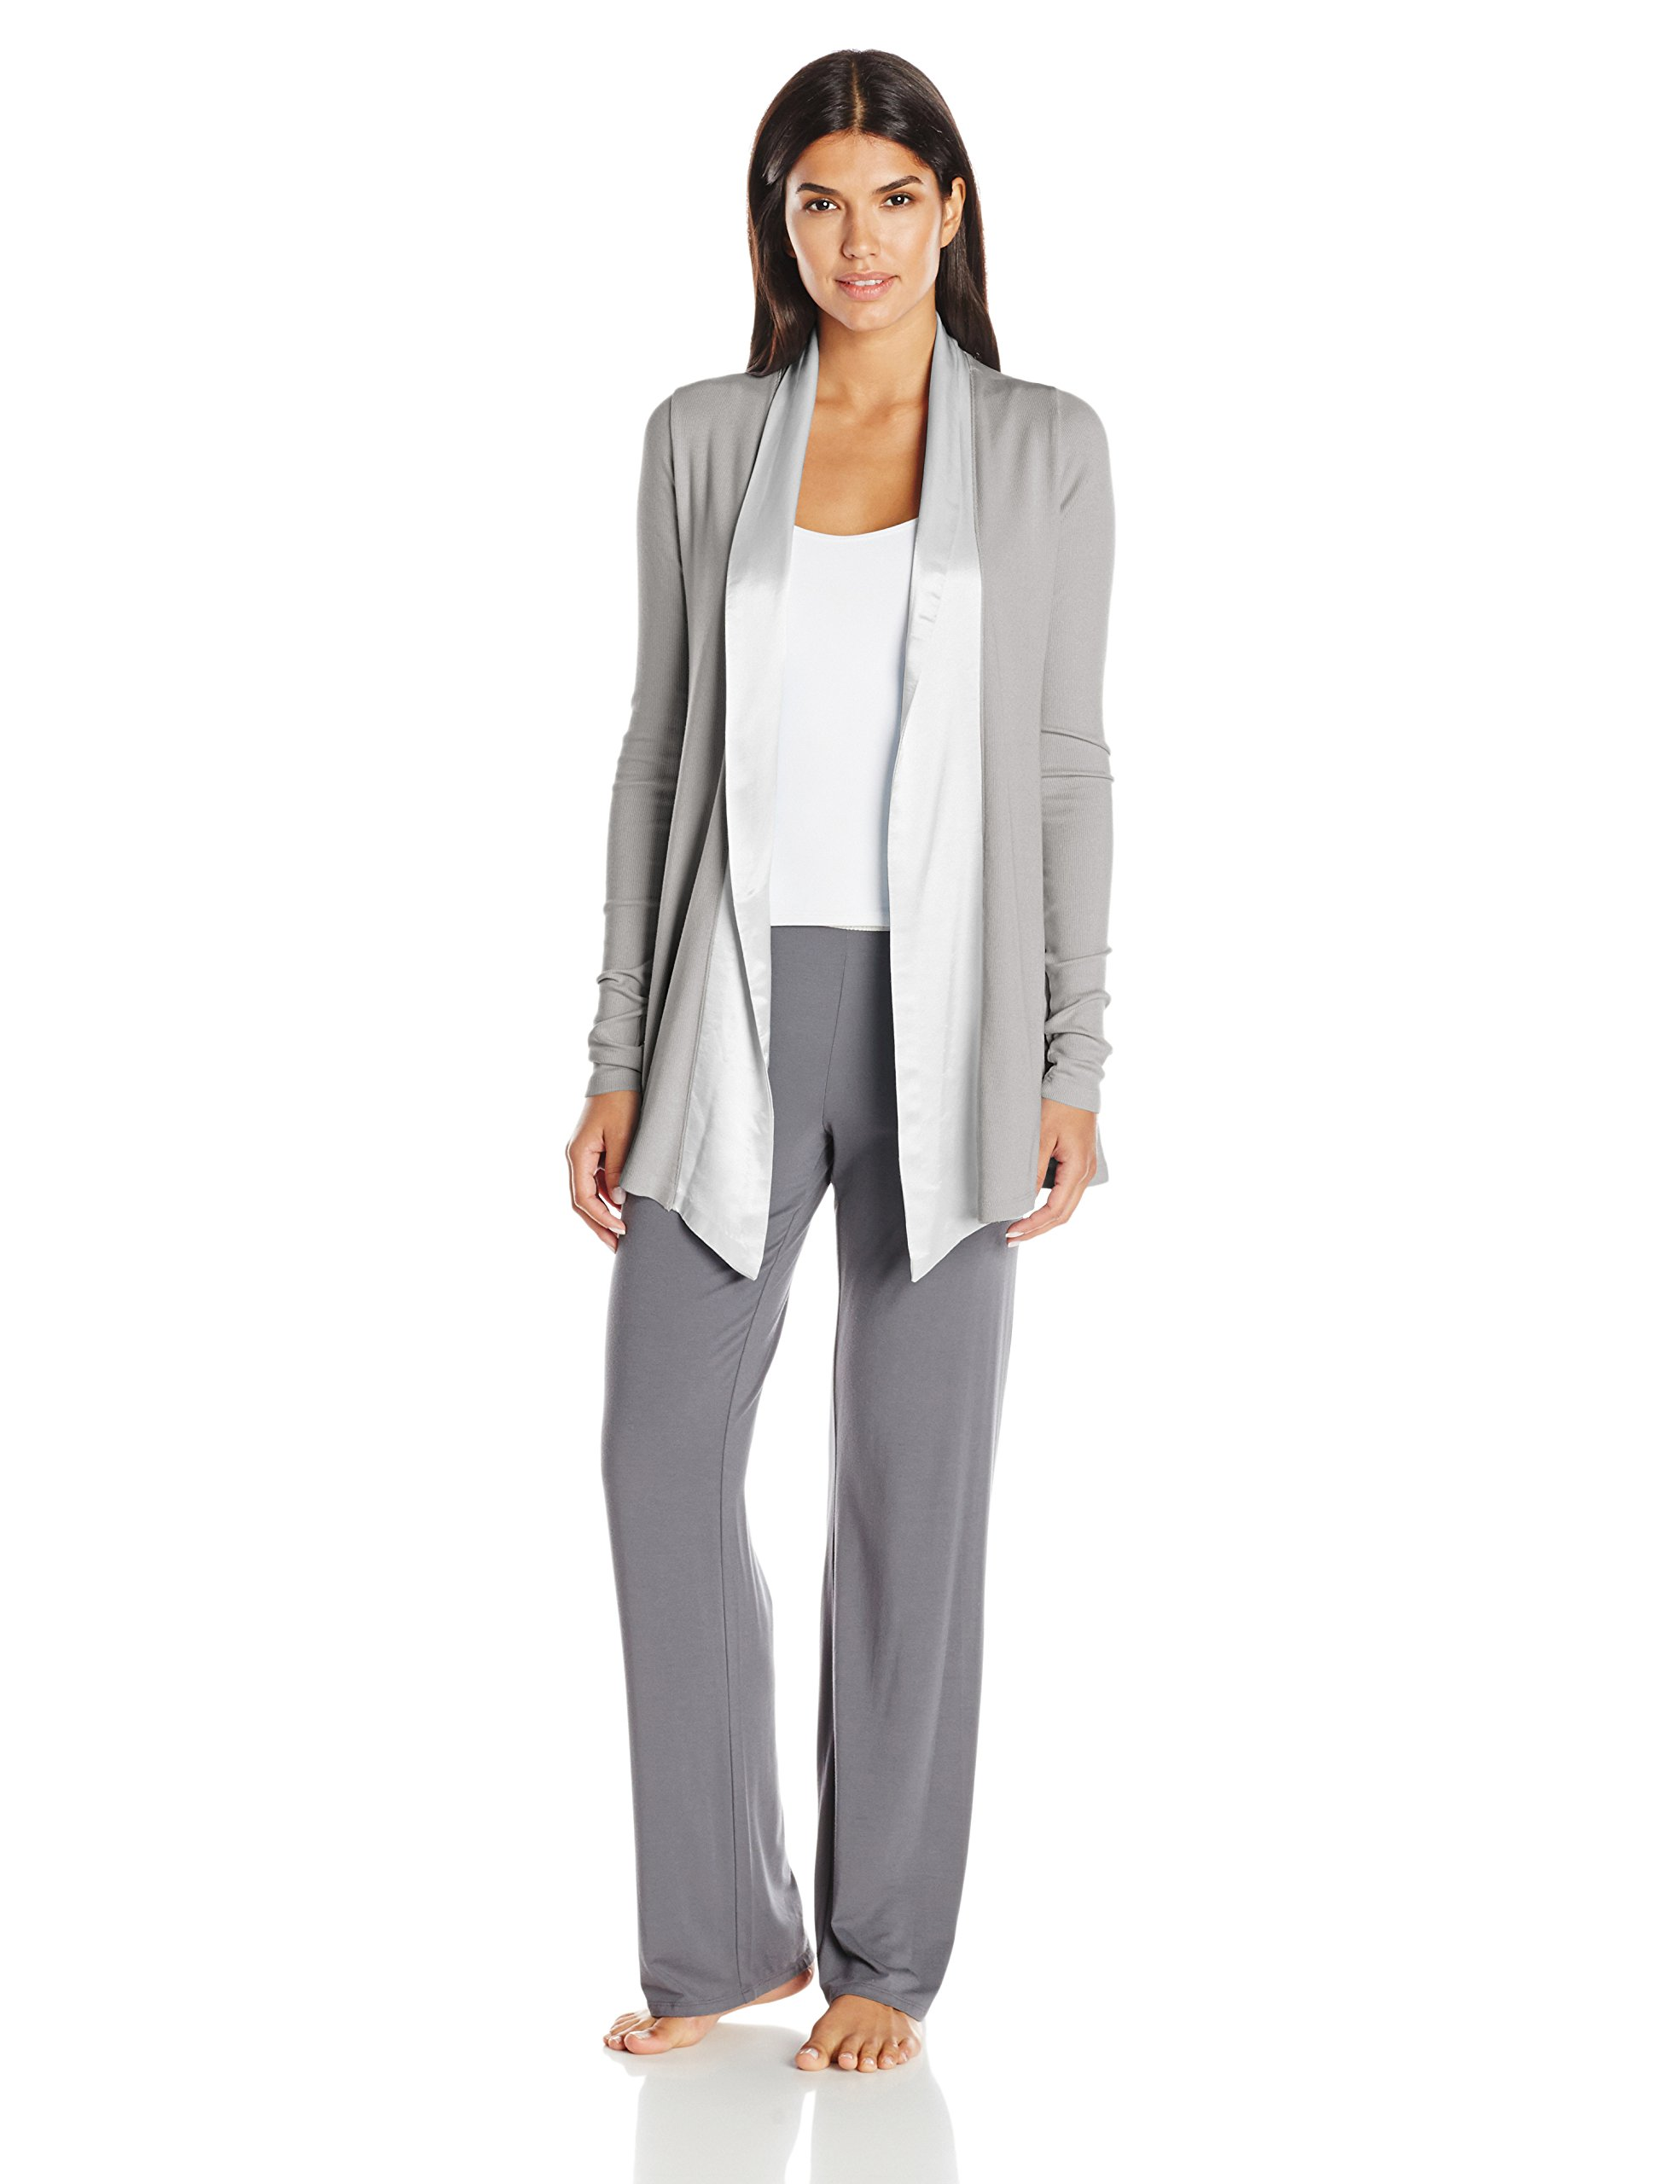 669802243c6 Best Rated in Women s Pajama Tops   Helpful Customer Reviews ...